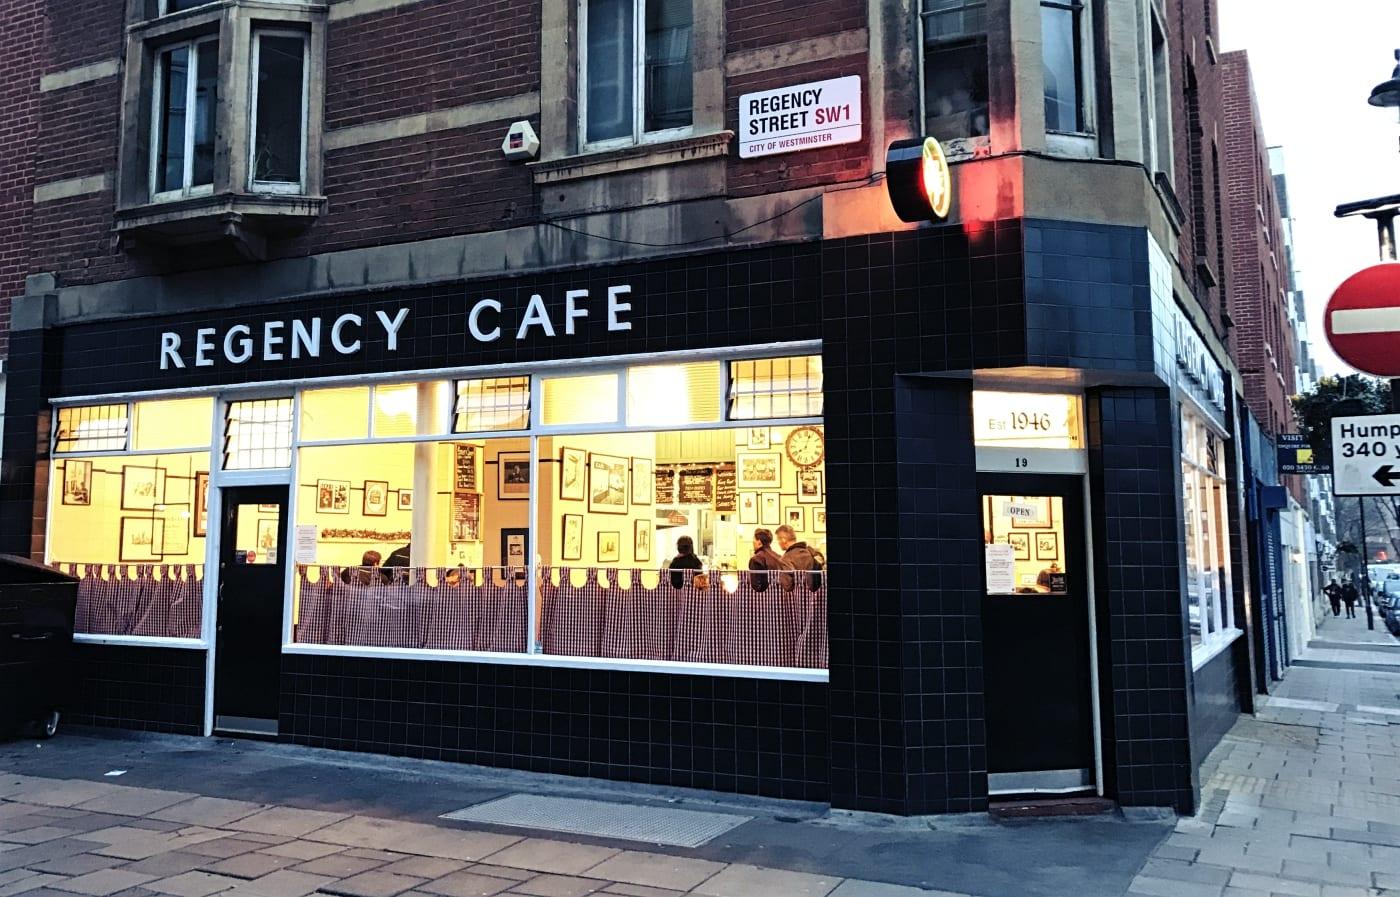 regency-cafe-london-3